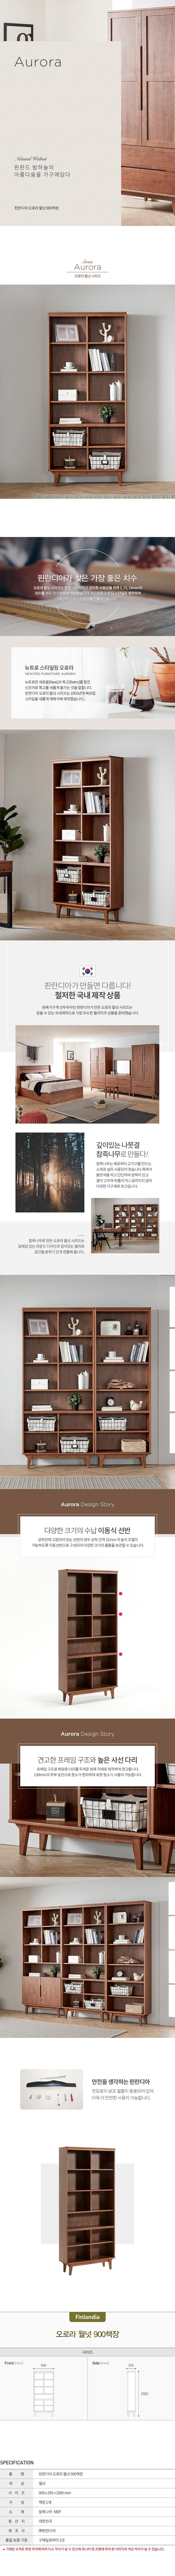 900bookcase.jpg